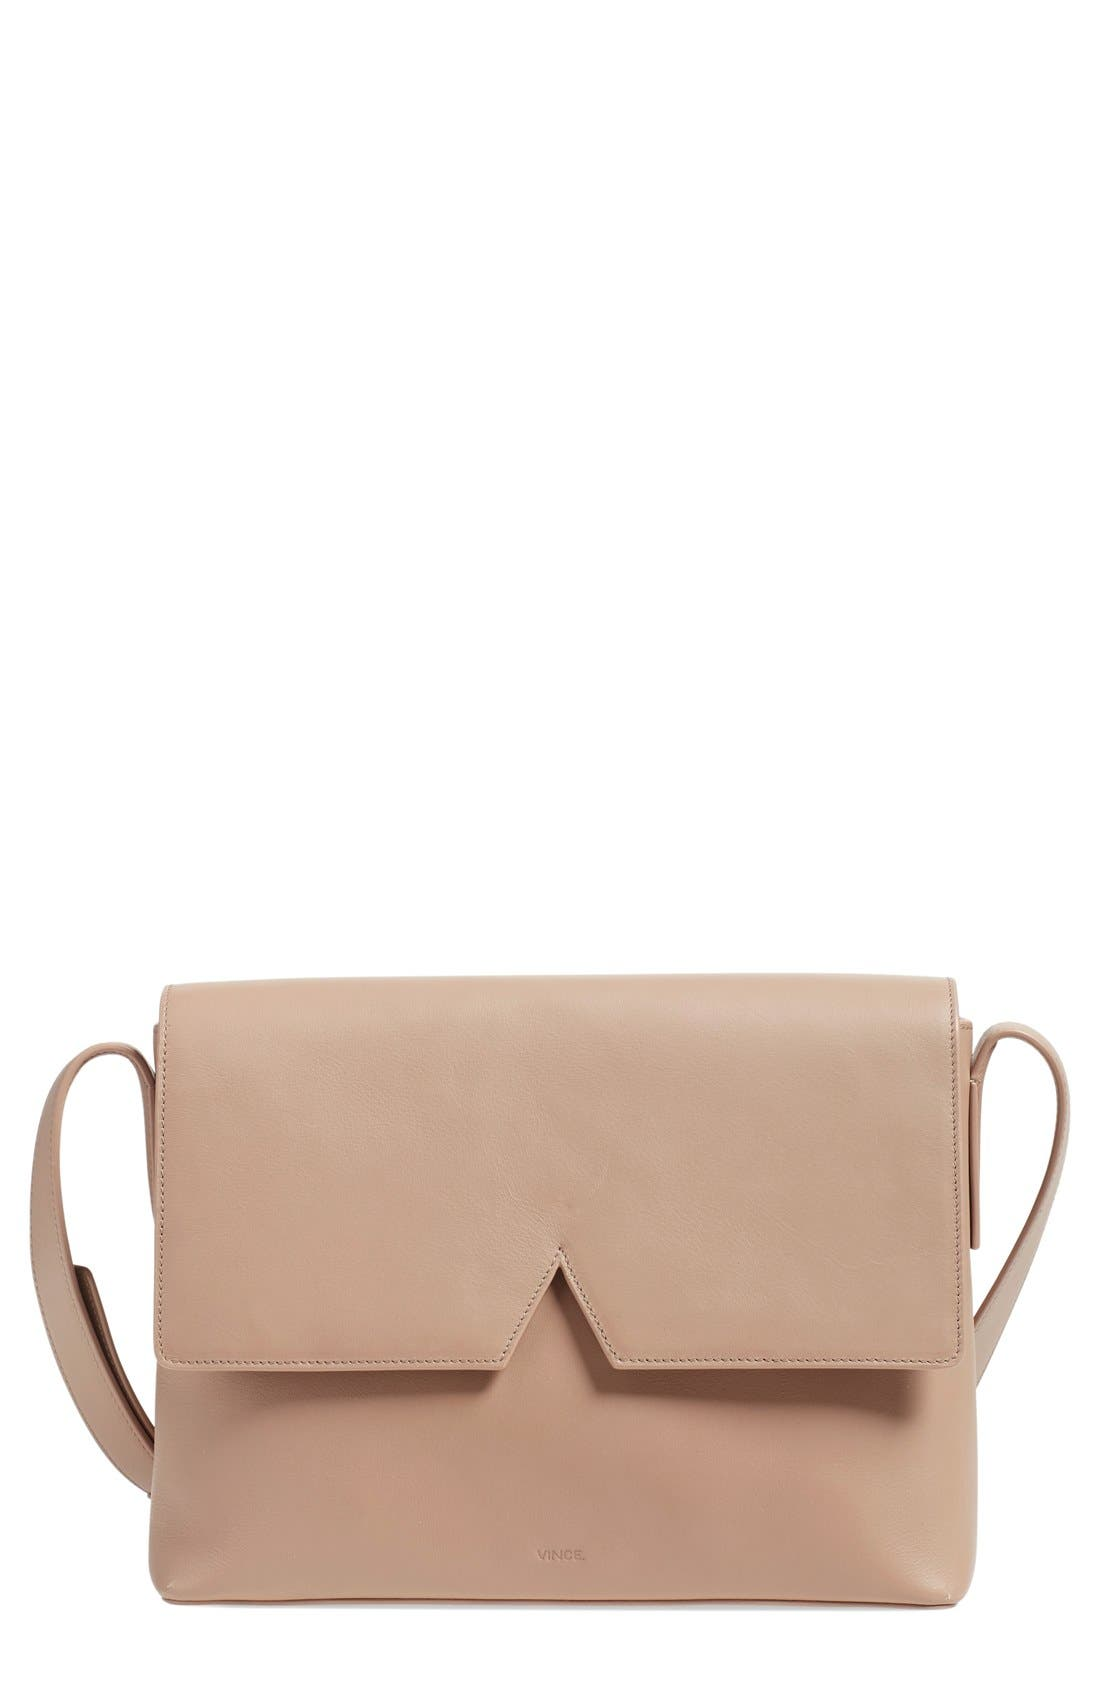 Main Image - Vince 'Medium Signature' Leather Crossbody Bag